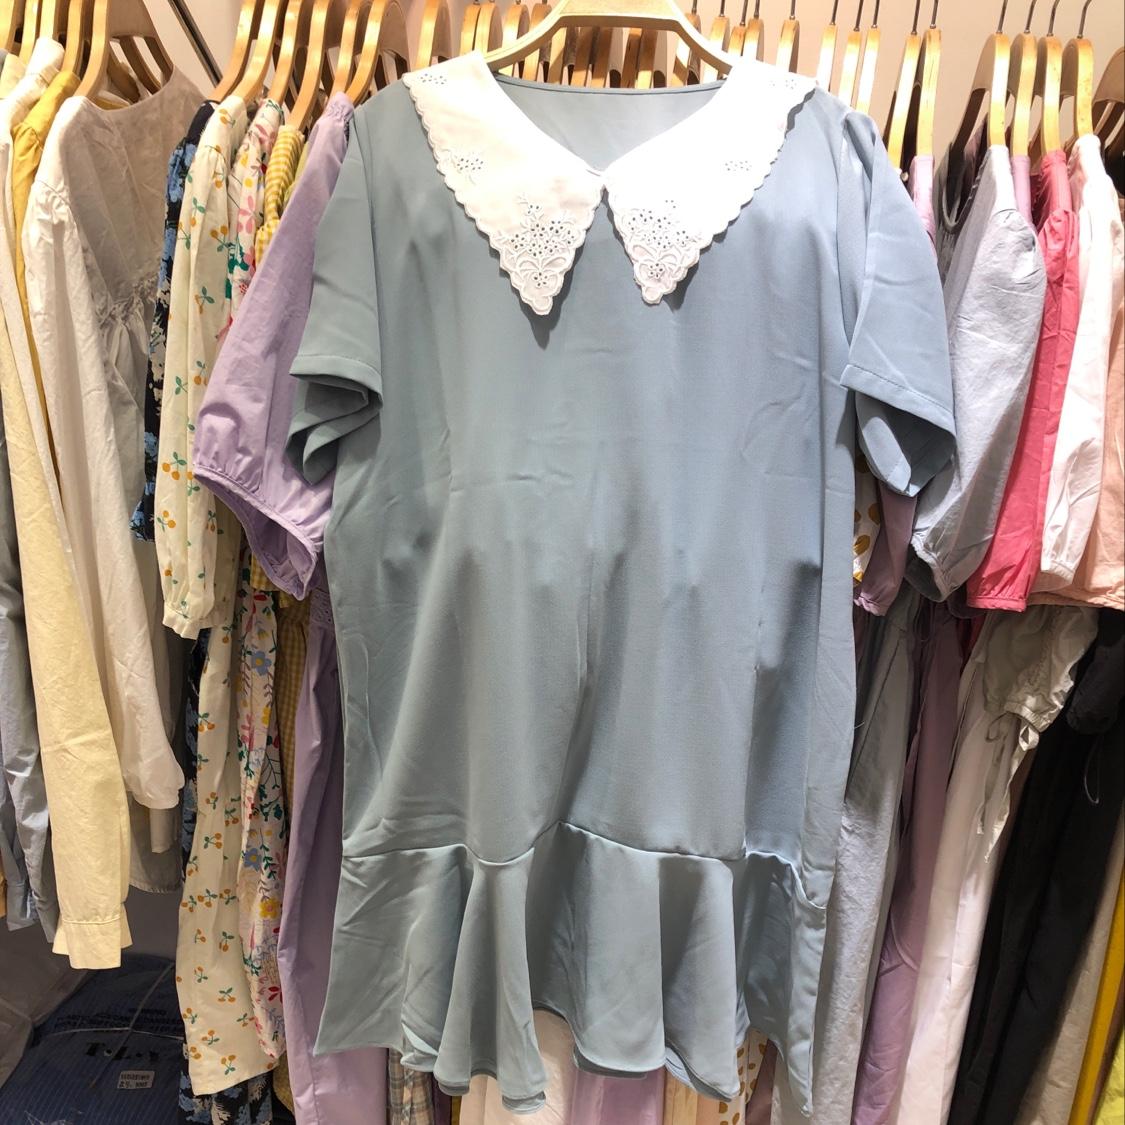 2020最新夏款雪纺裙2020最新夏款雪纺裙2020最新夏款雪纺裙